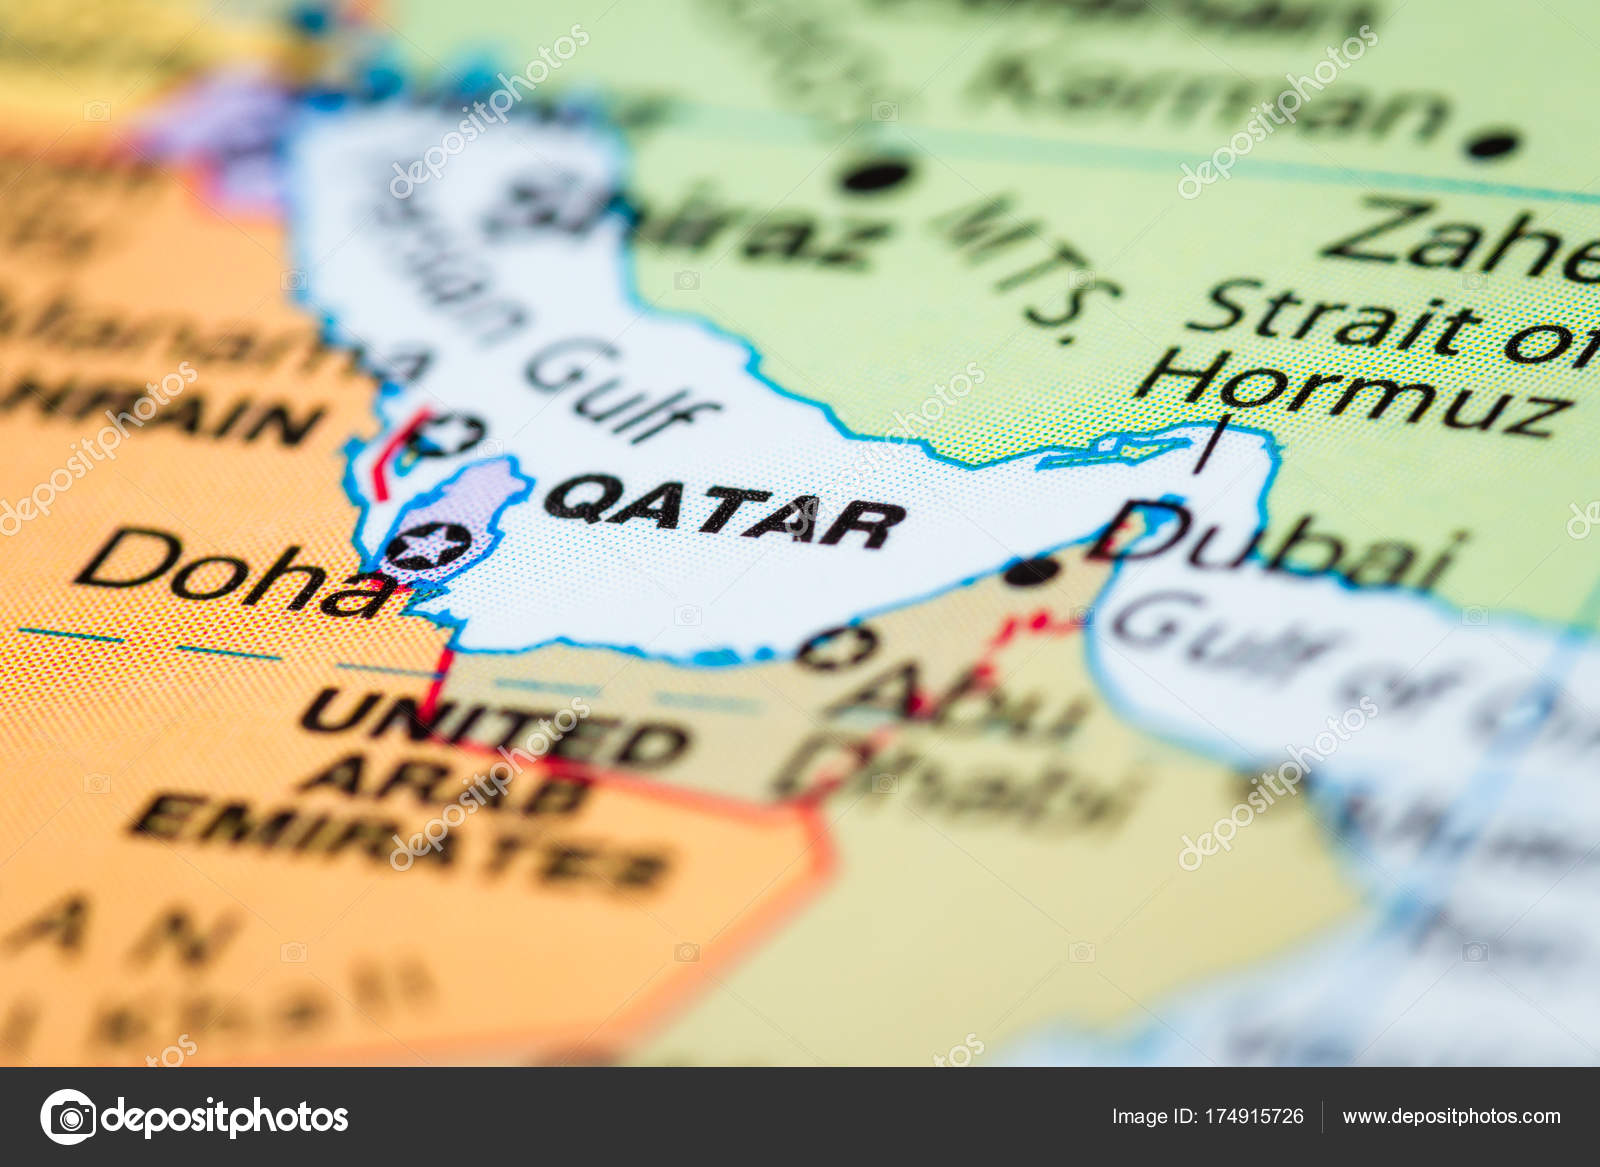 Qatar Dubai Carte.Qatar Sur Une Carte Photographie Wollertz C 174915726